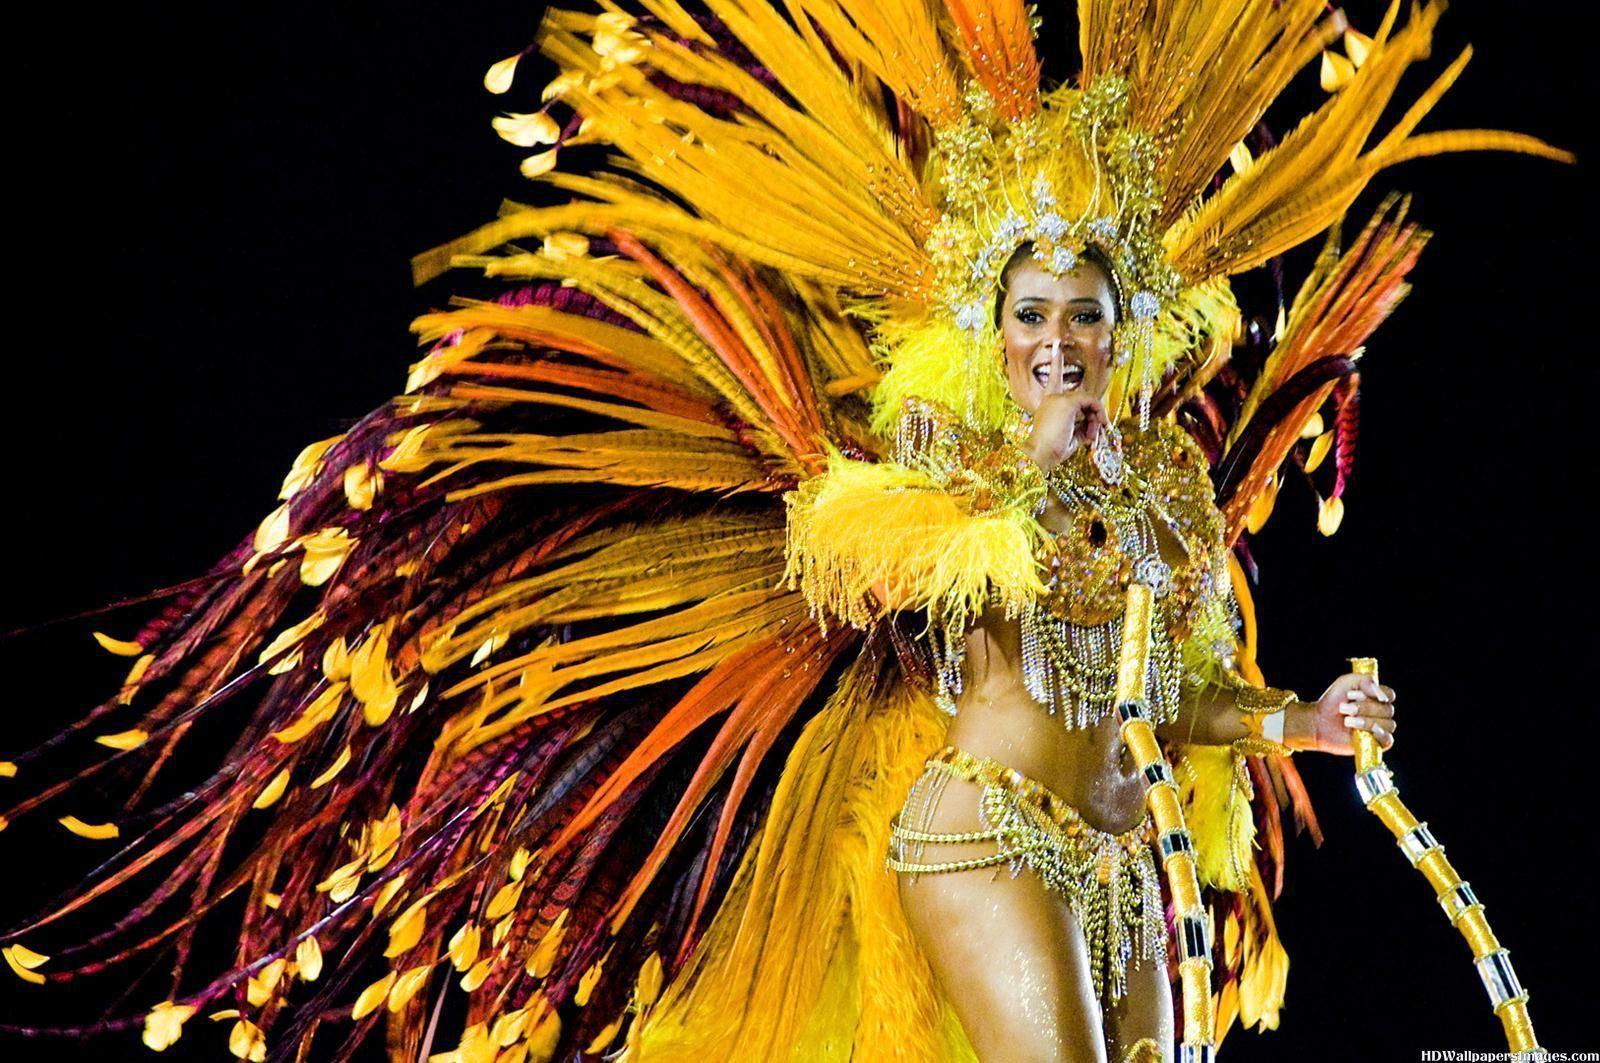 Carnival brazil wallpapers top free carnival brazil - Carnival wallpaper ...